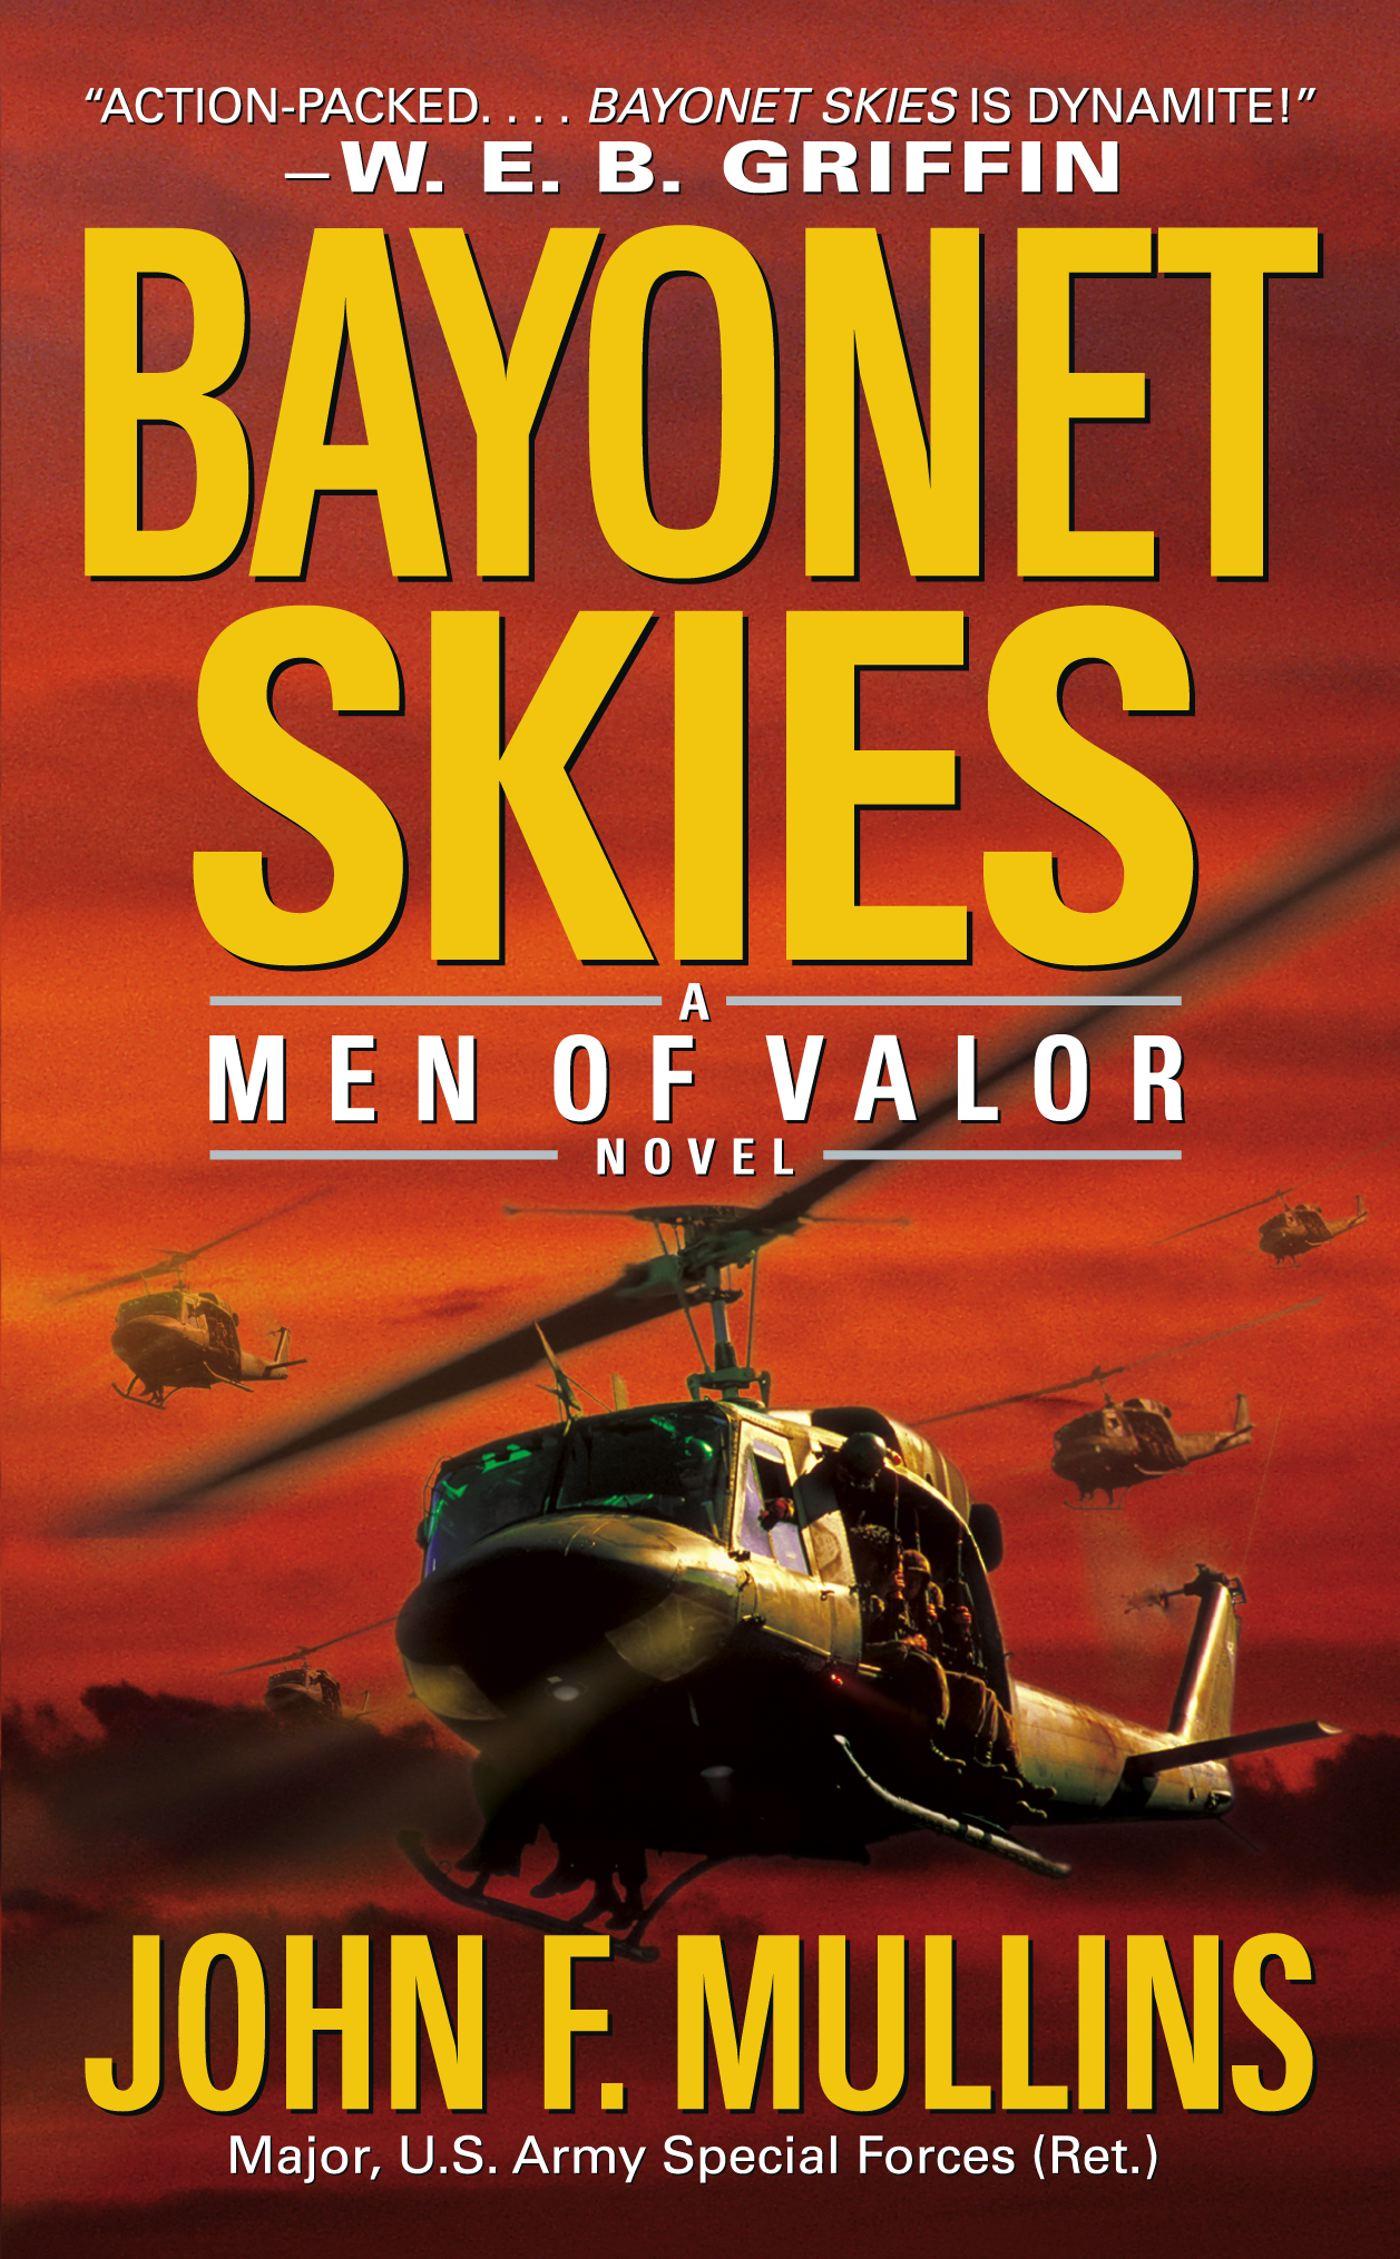 Book Cover Image (jpg): Bayonet Skies